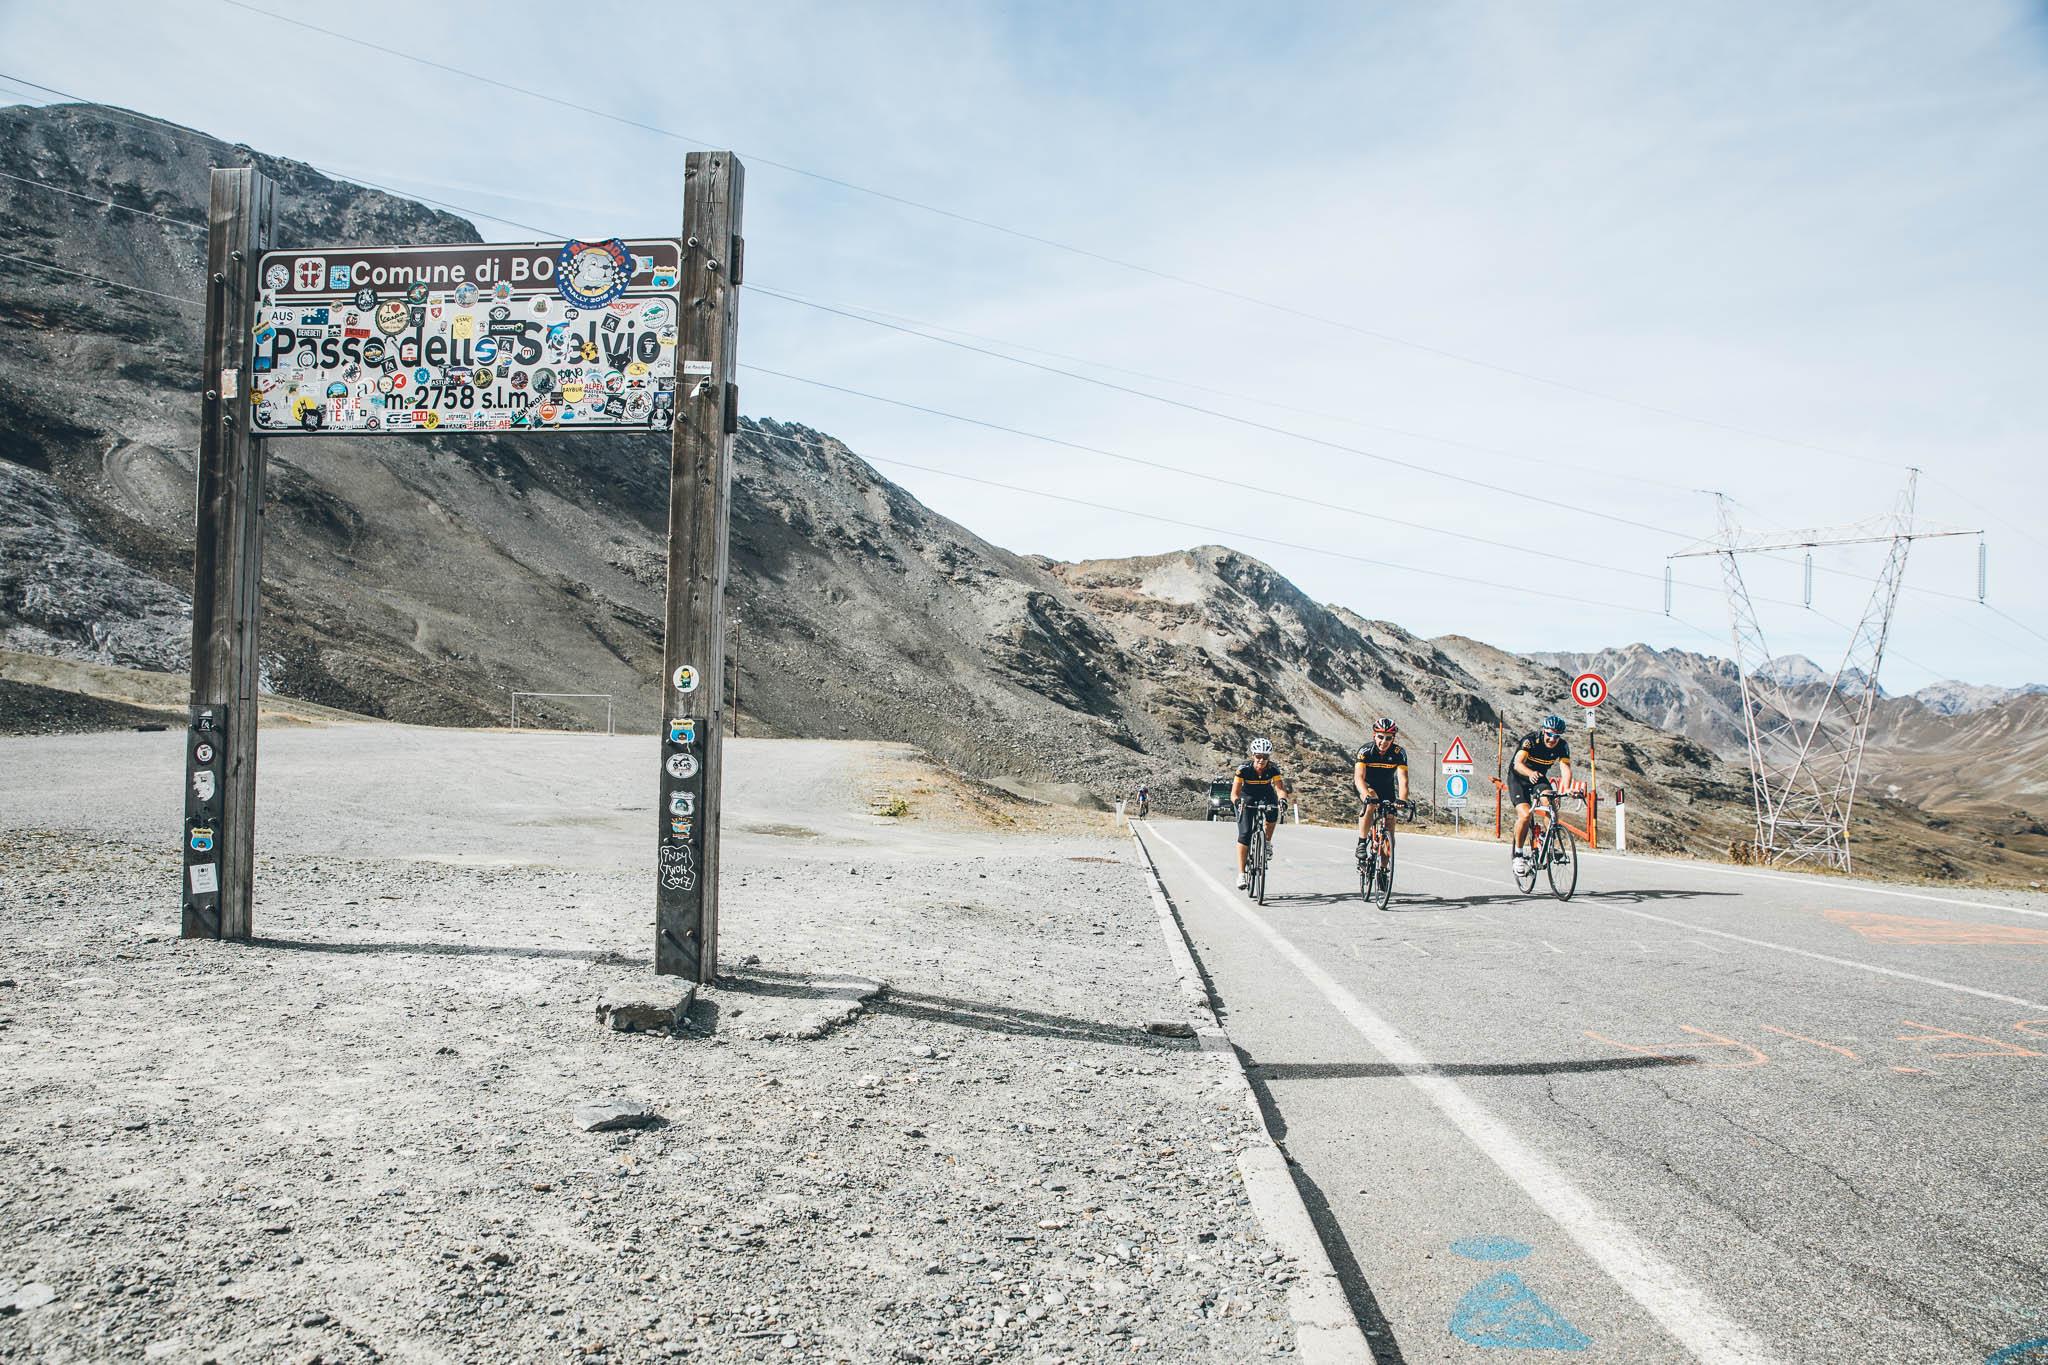 Motul roads: The Stelvio Pass